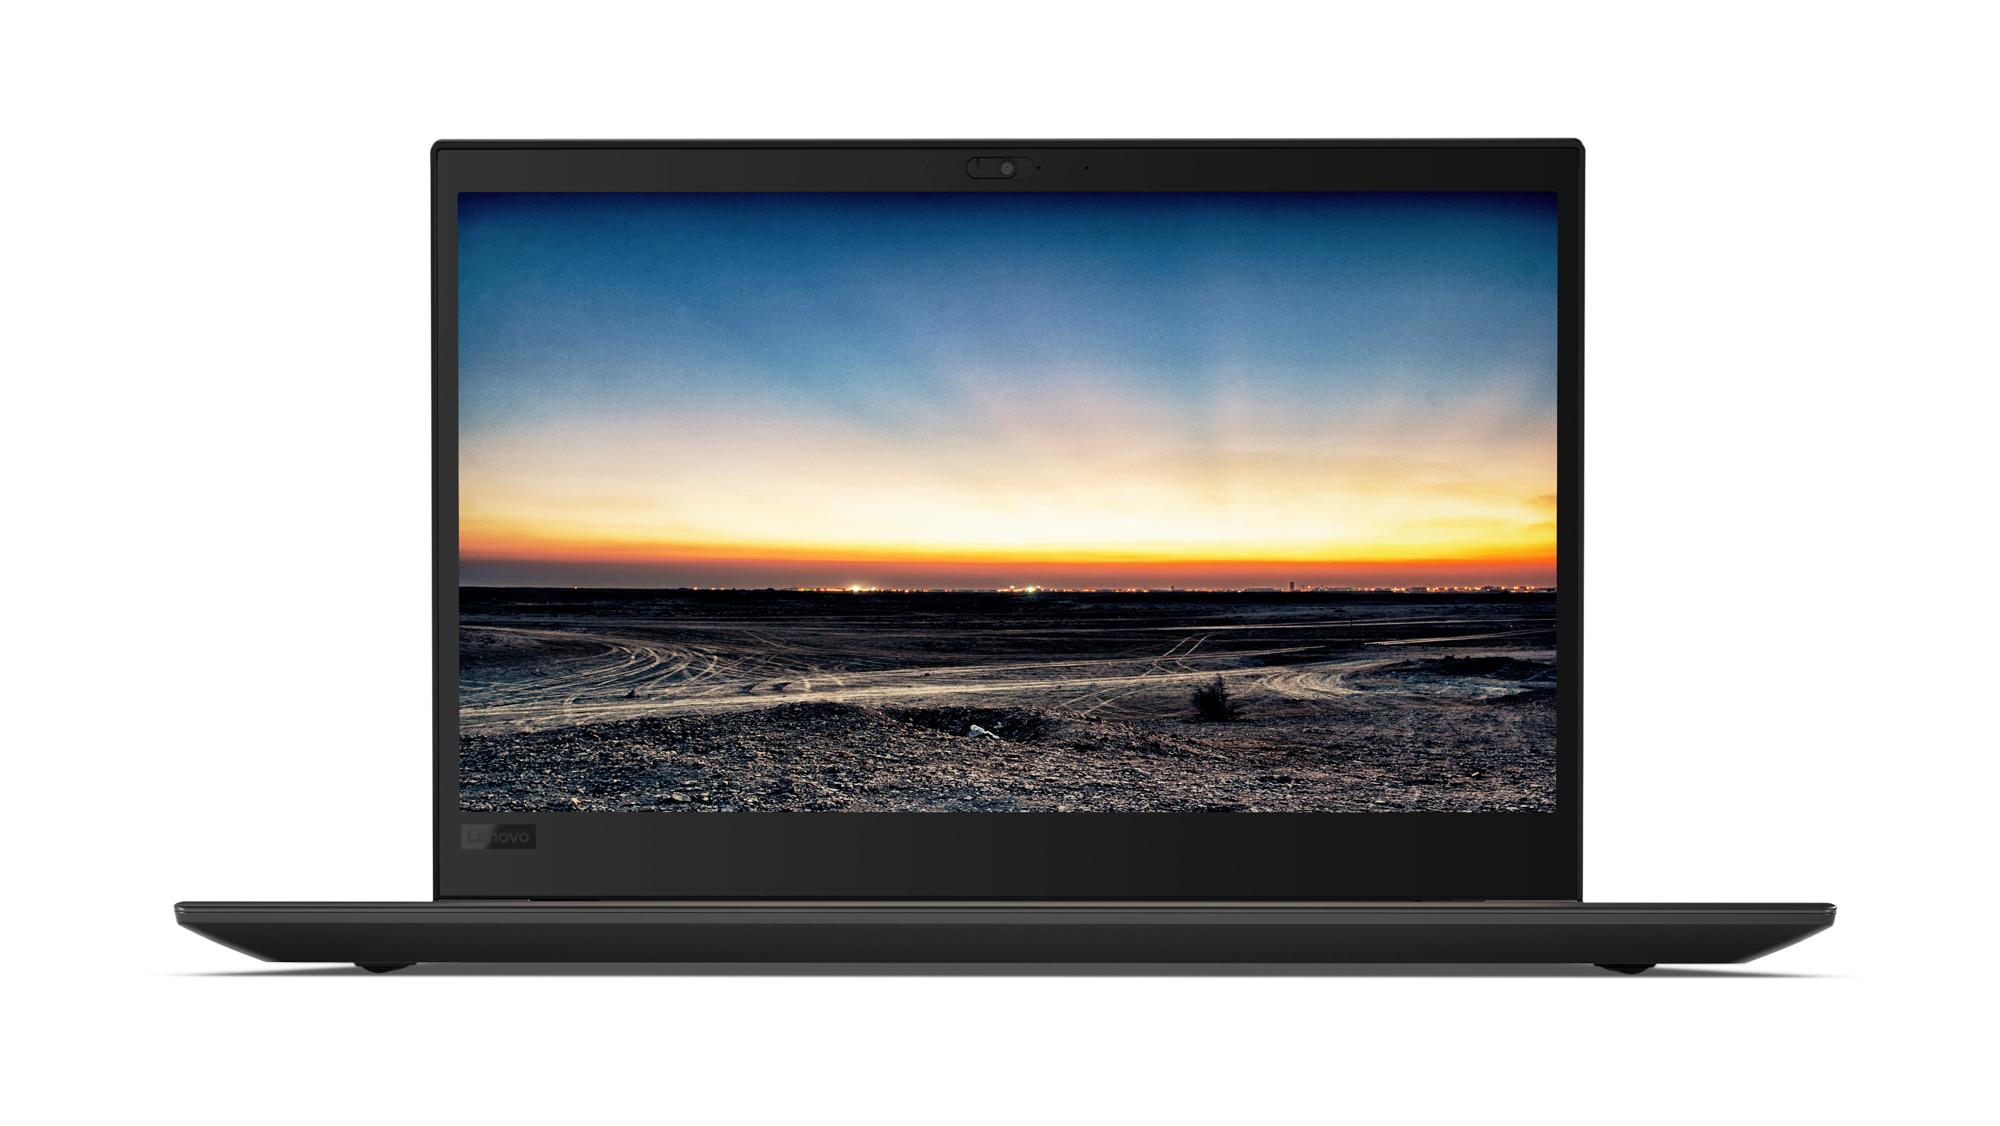 Lenovo ThinkPad T580 Black Notebook 39.6 cm (15.6